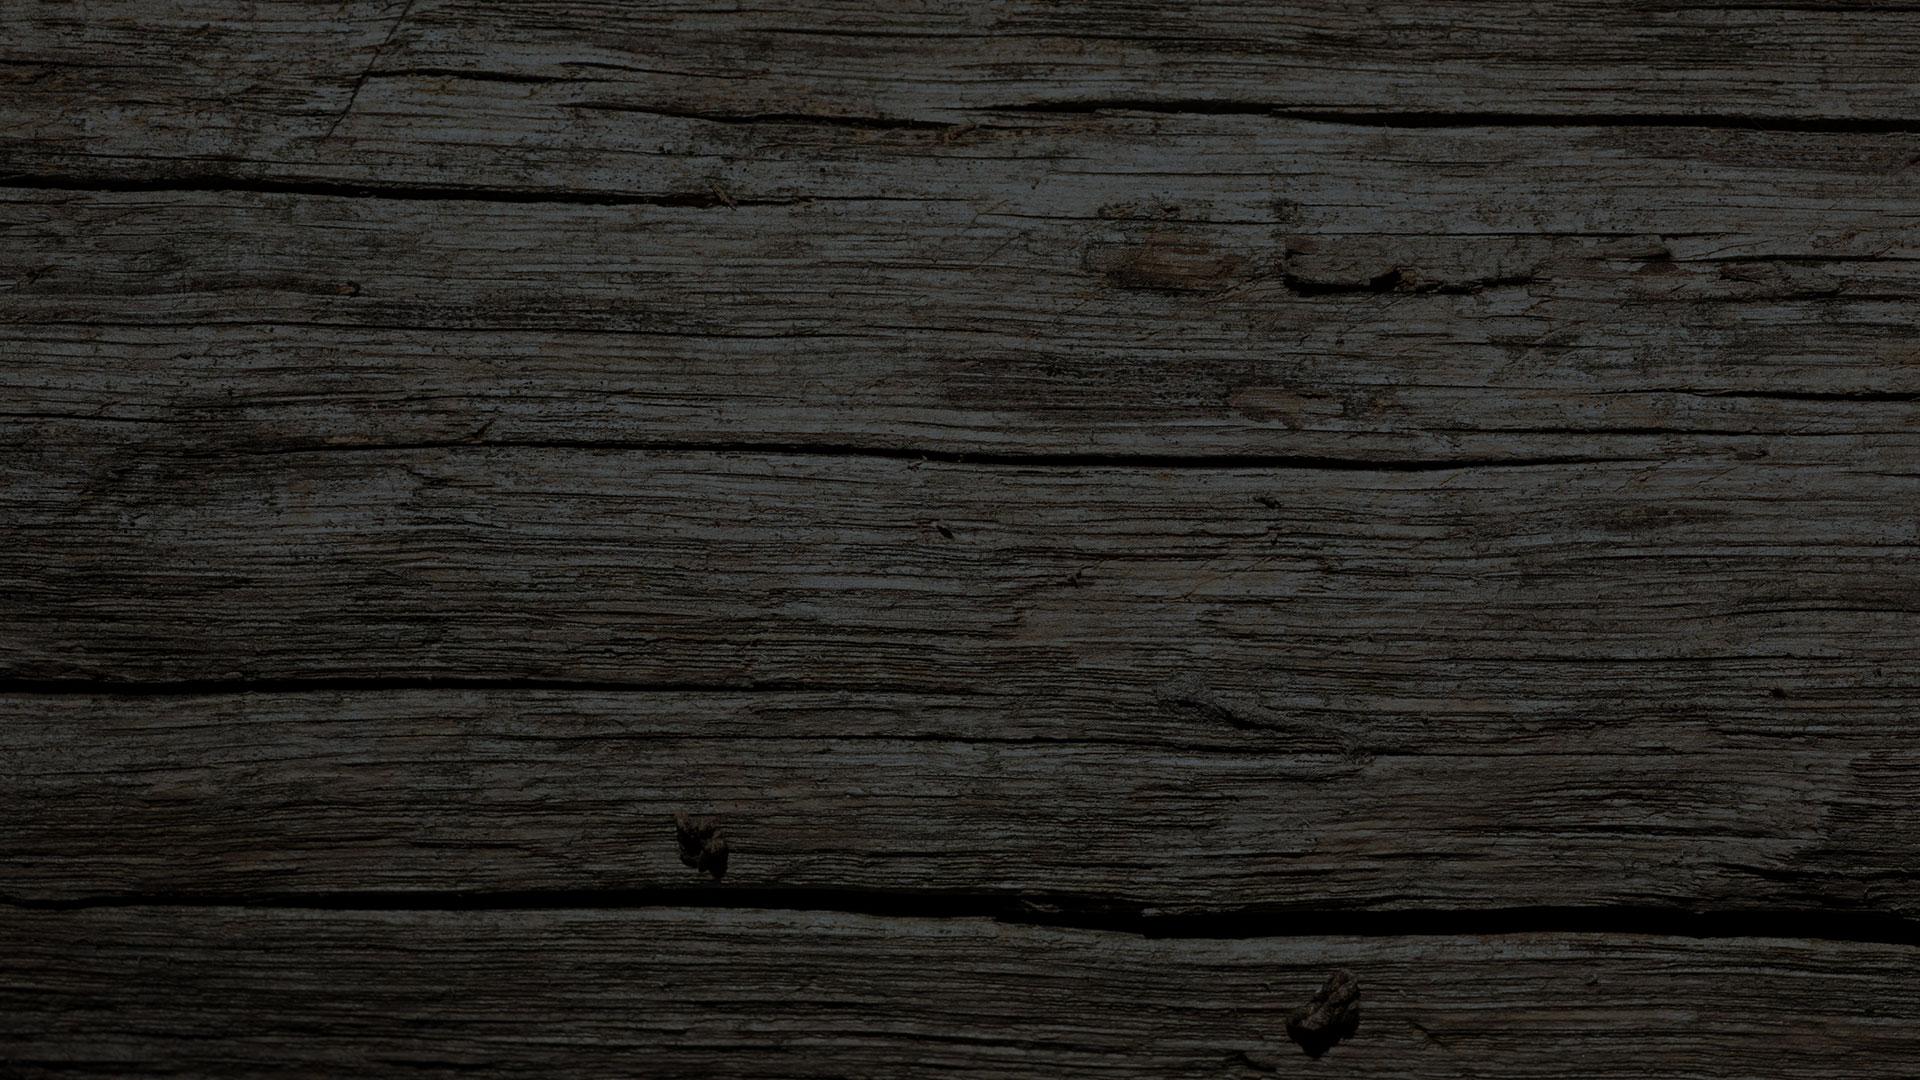 Dark Wood Texture The Rebel Pig